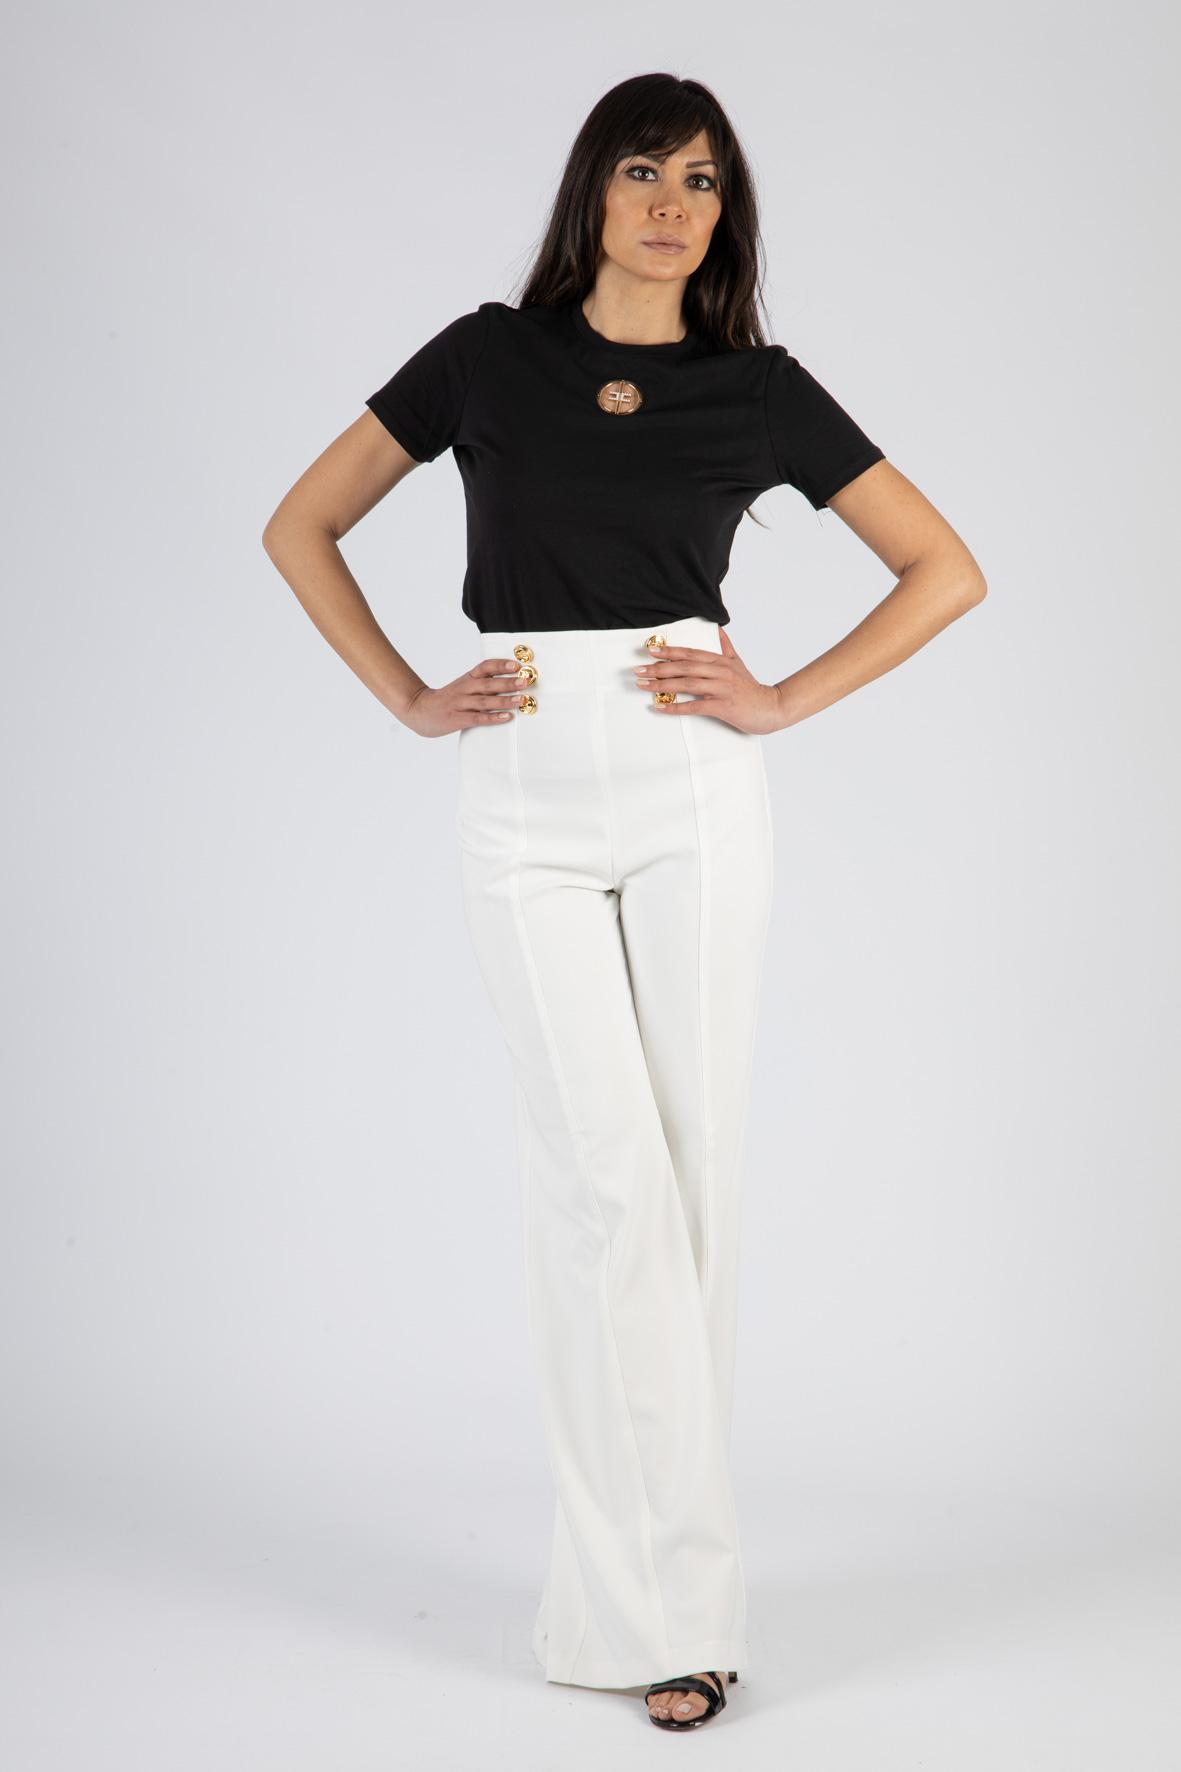 T-shirt Elisabetta Franchi con logo in strass ricamato ELISABETTA FRANCHI   T-shirt   MA25N11E2110